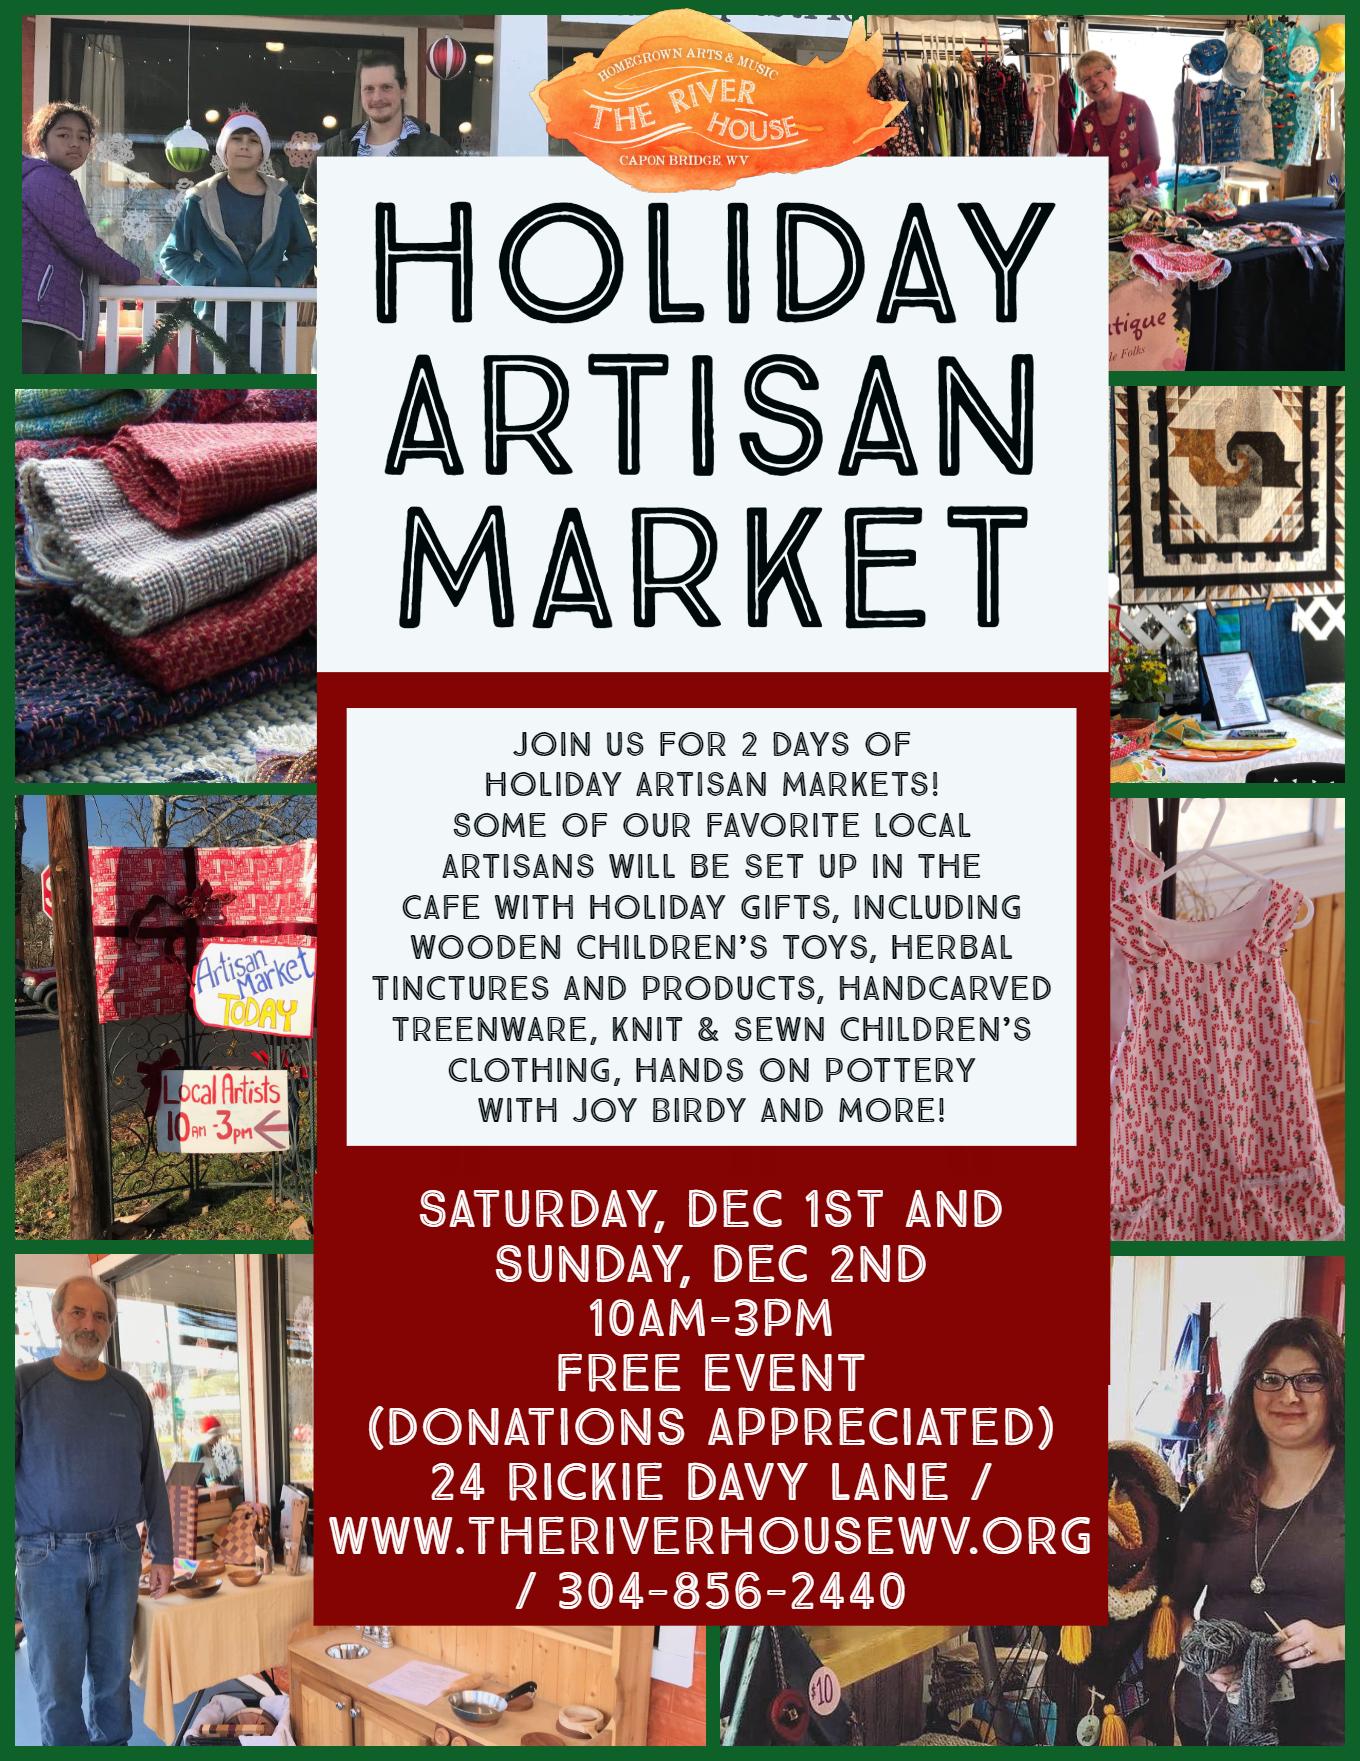 Holiday Artisan Market Flyer 2 days.jpg